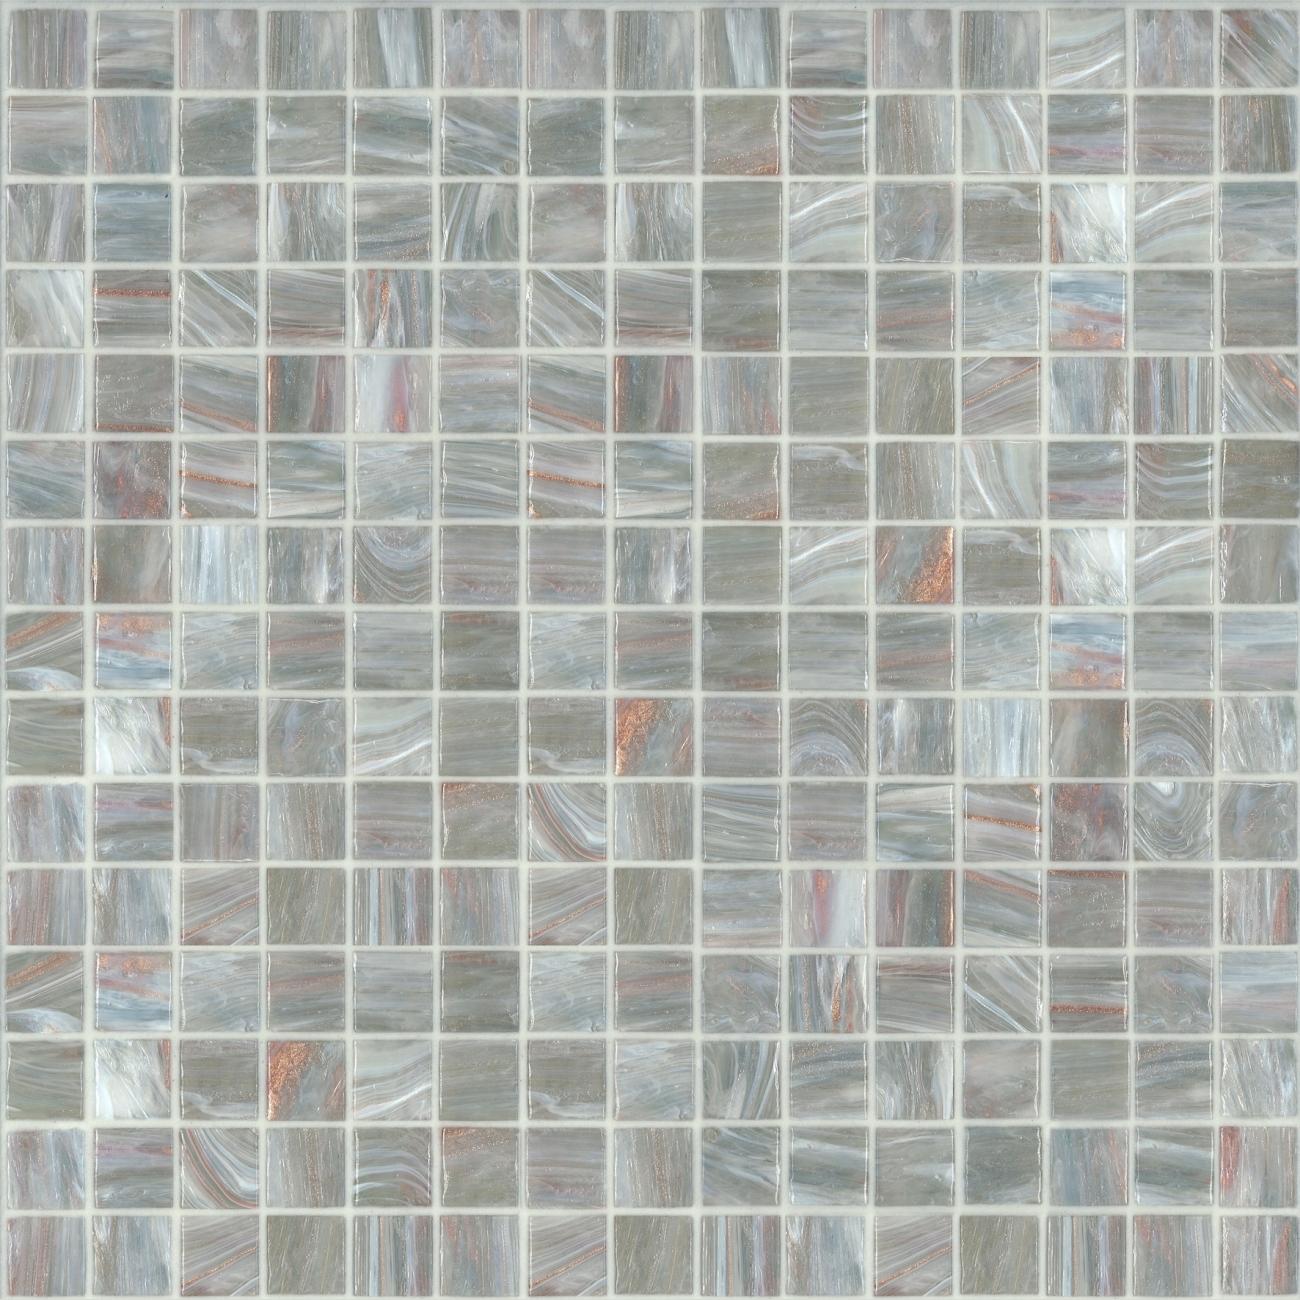 laminate floors in kitchen narrow sink bisazza mosaico le gemme 20 - tattahome